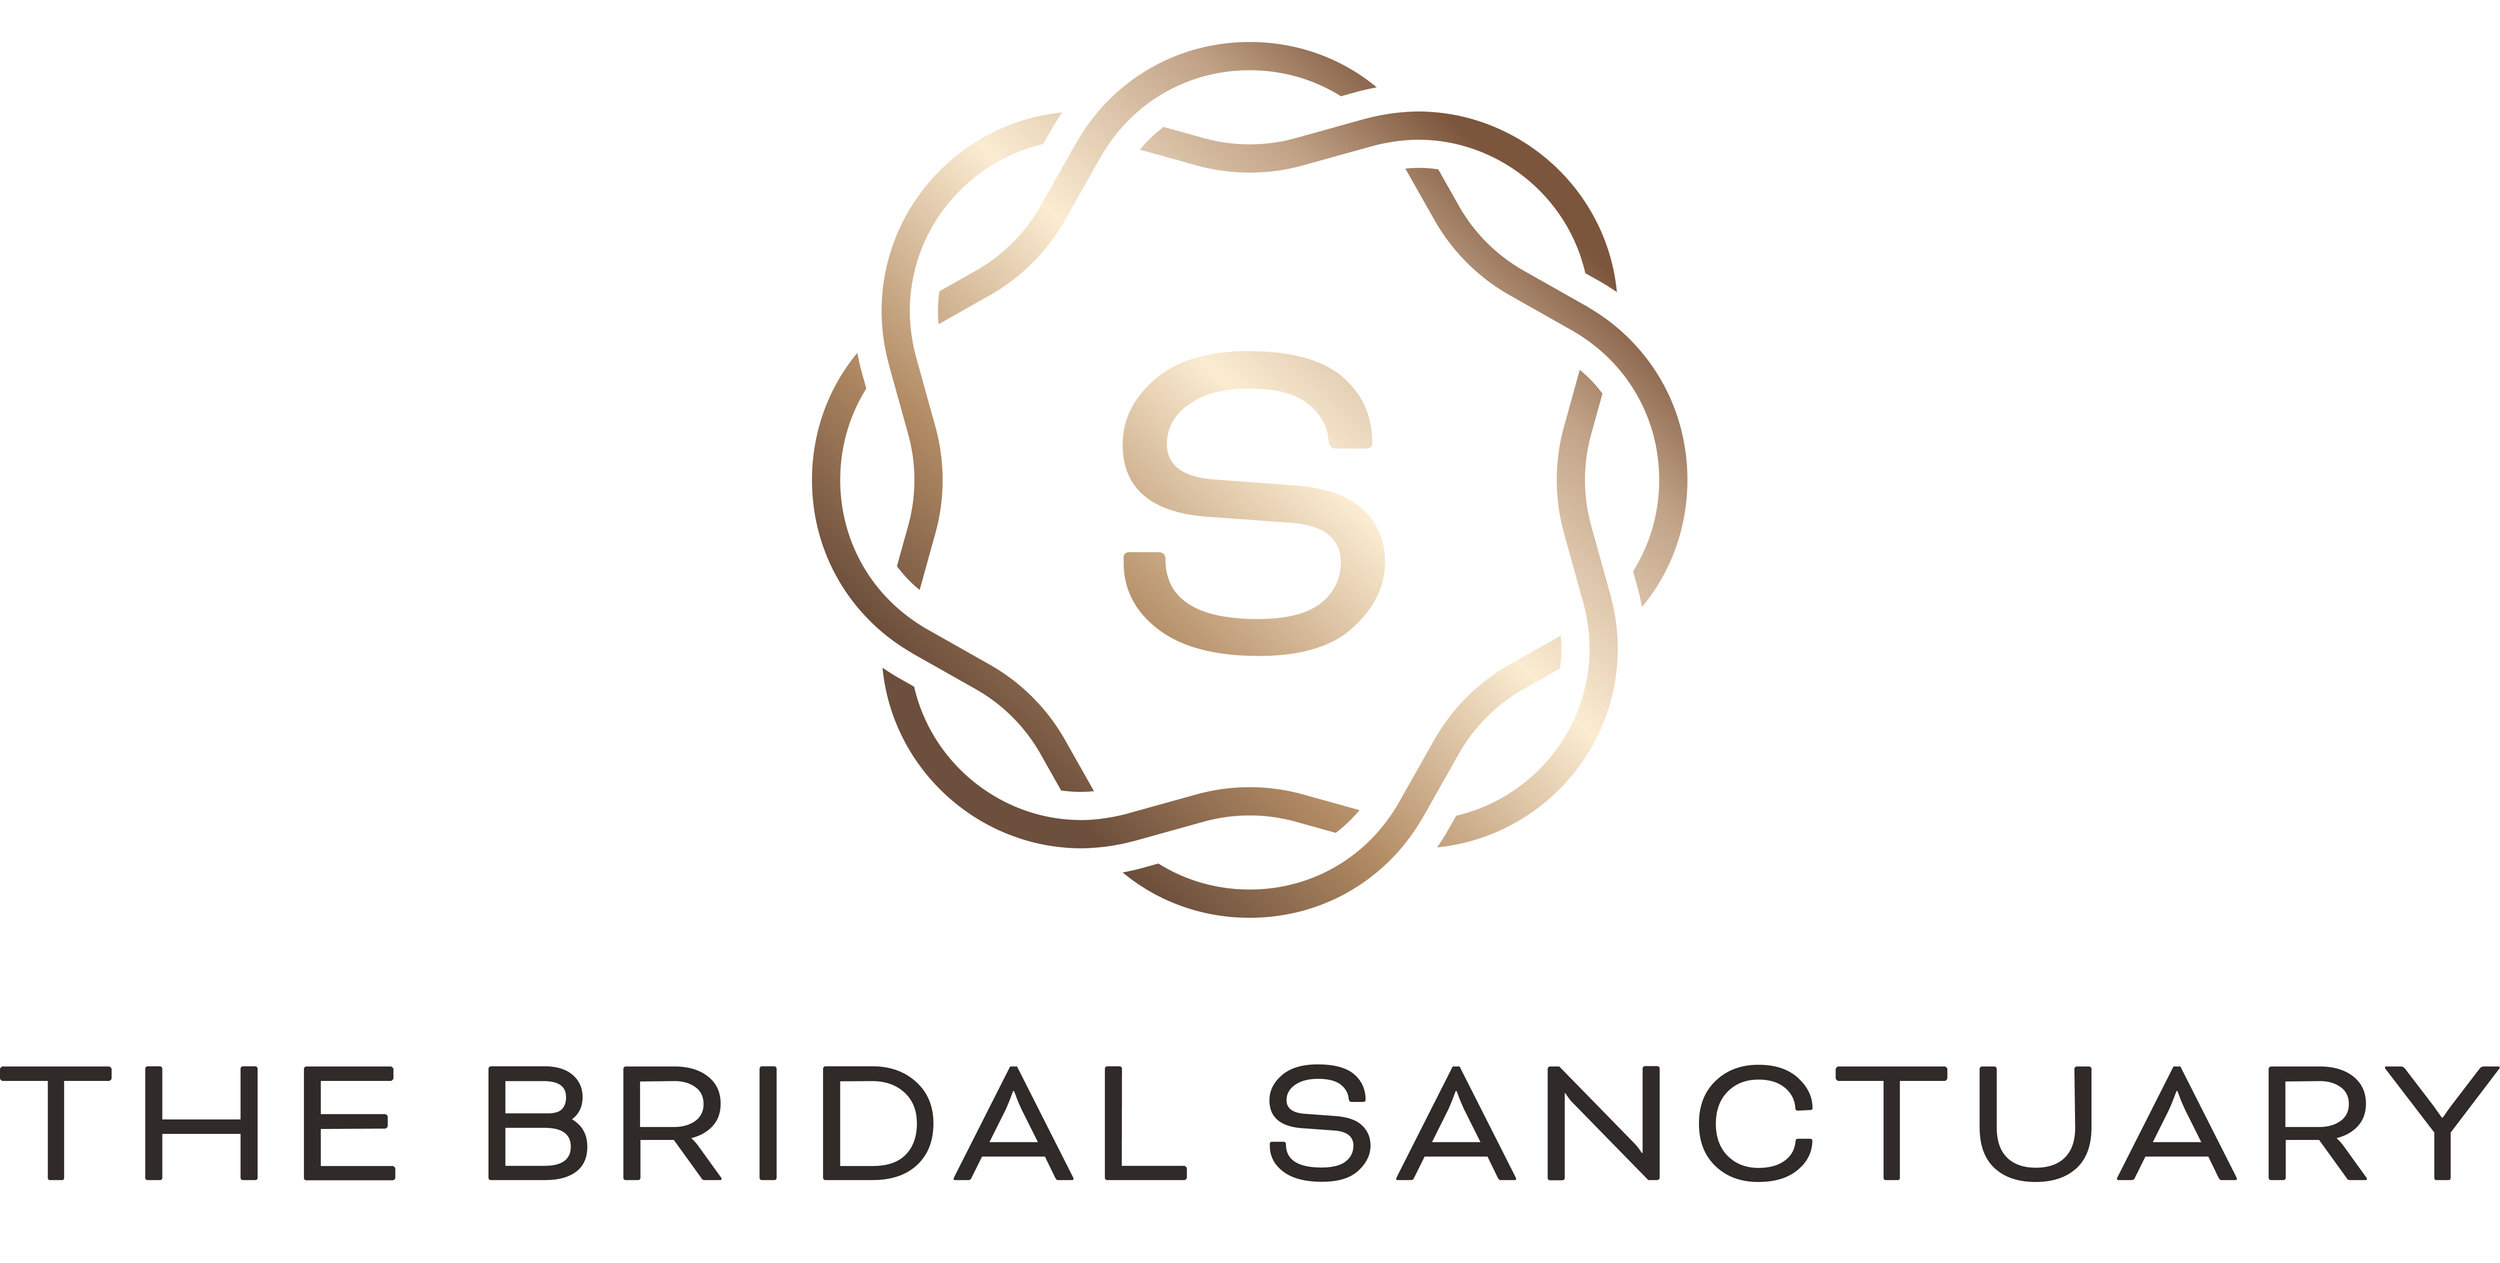 thebridalsanctuary-notext-logo-main.jpg